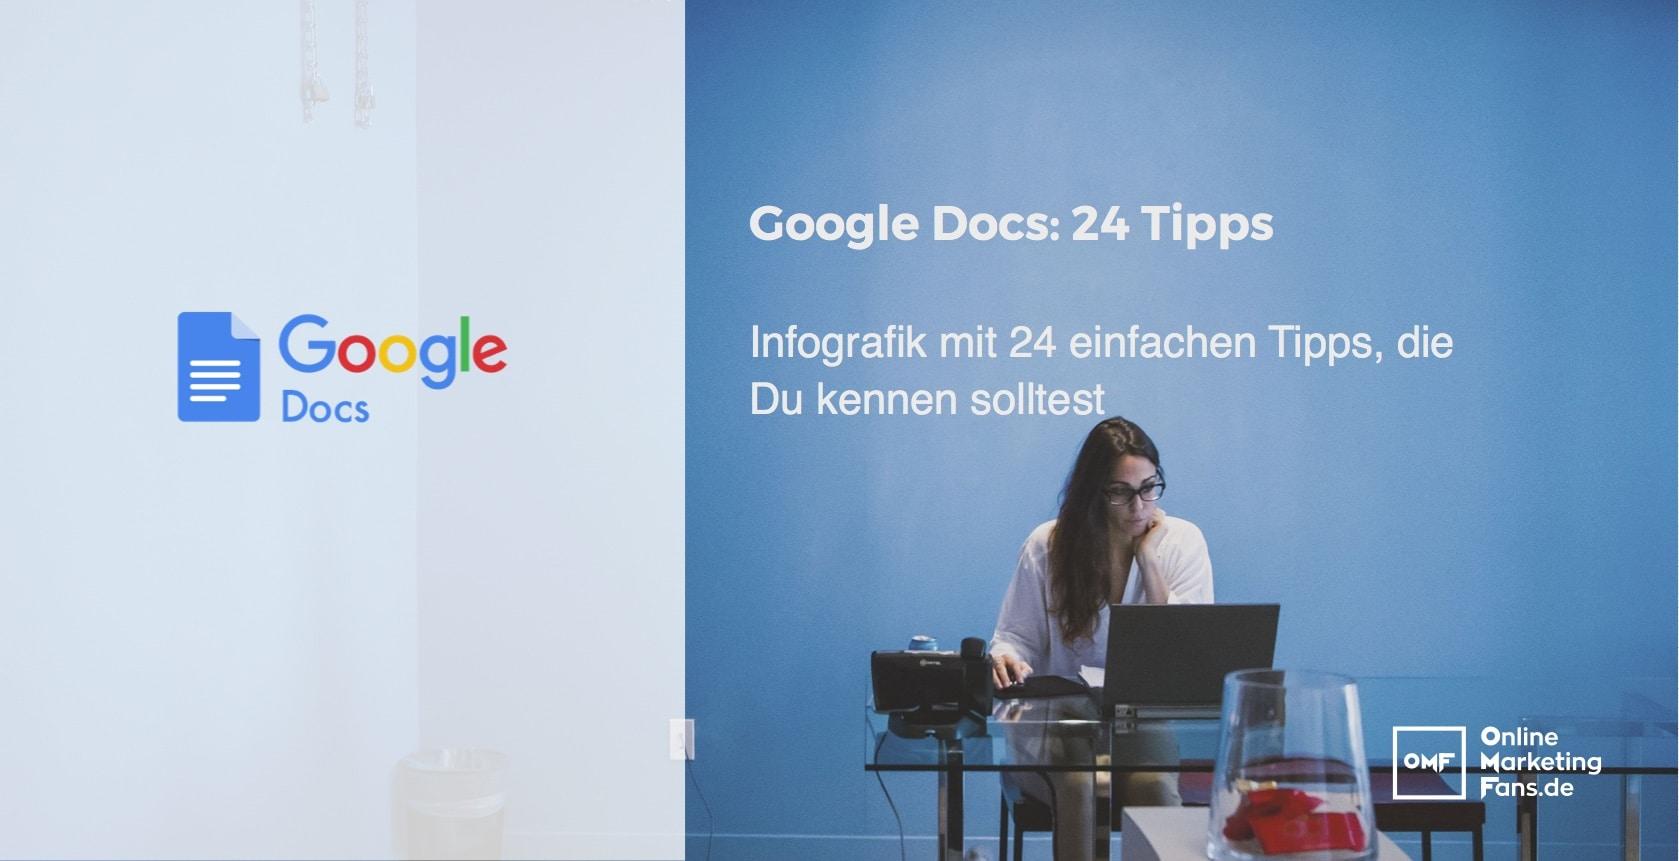 Google Docs 24 Tipps